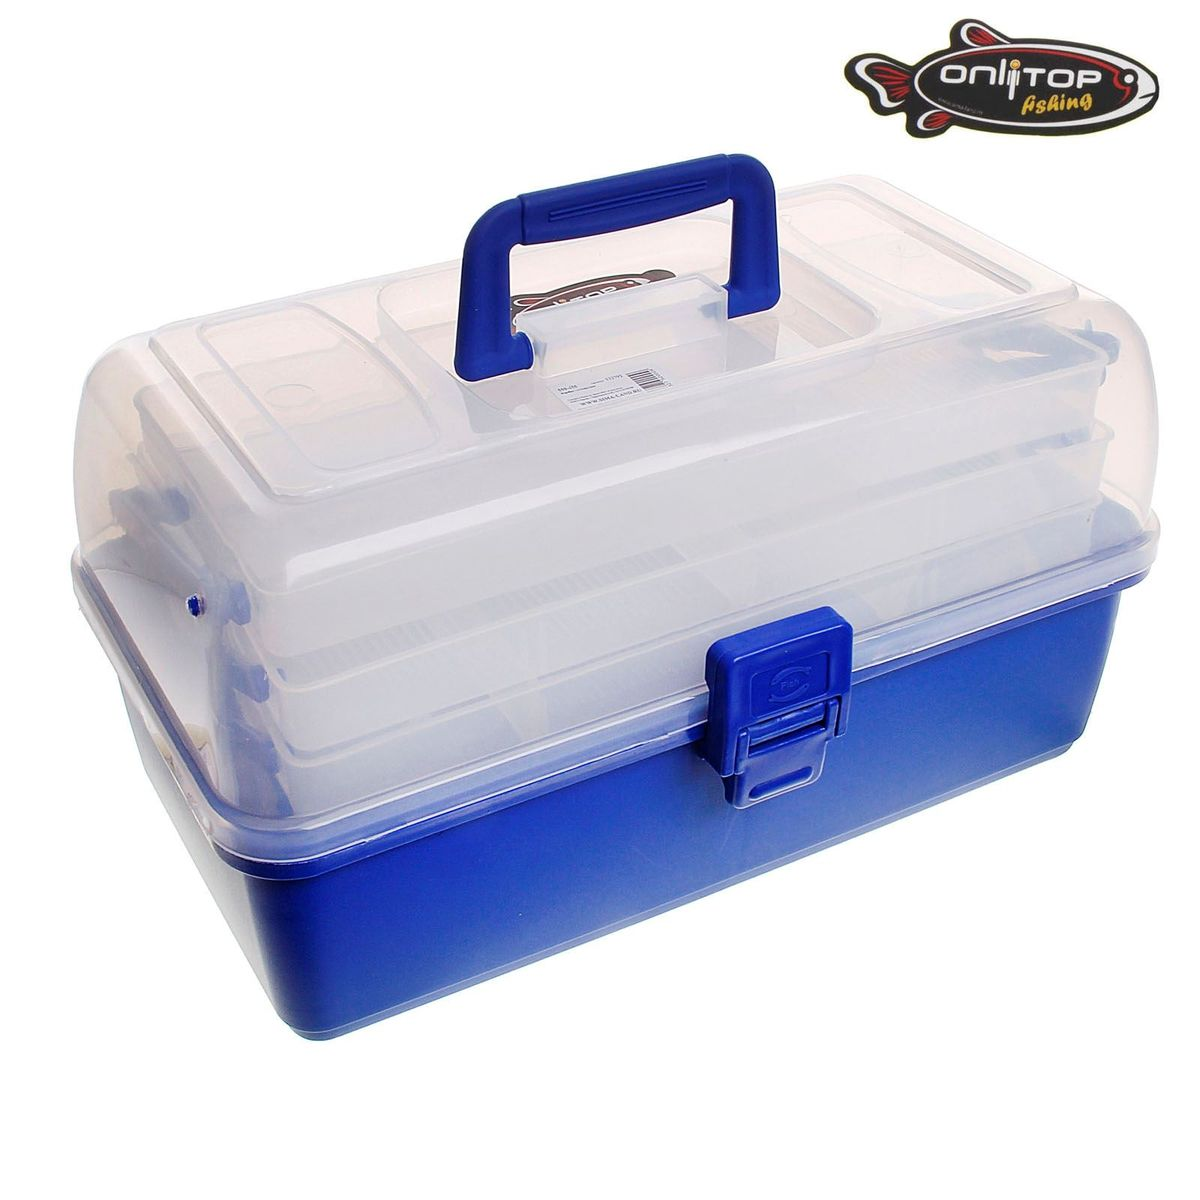 Коробка для крючков и насадок Onlitop, трехъярусная, цвет: синий, 17 х 34 х 20 см